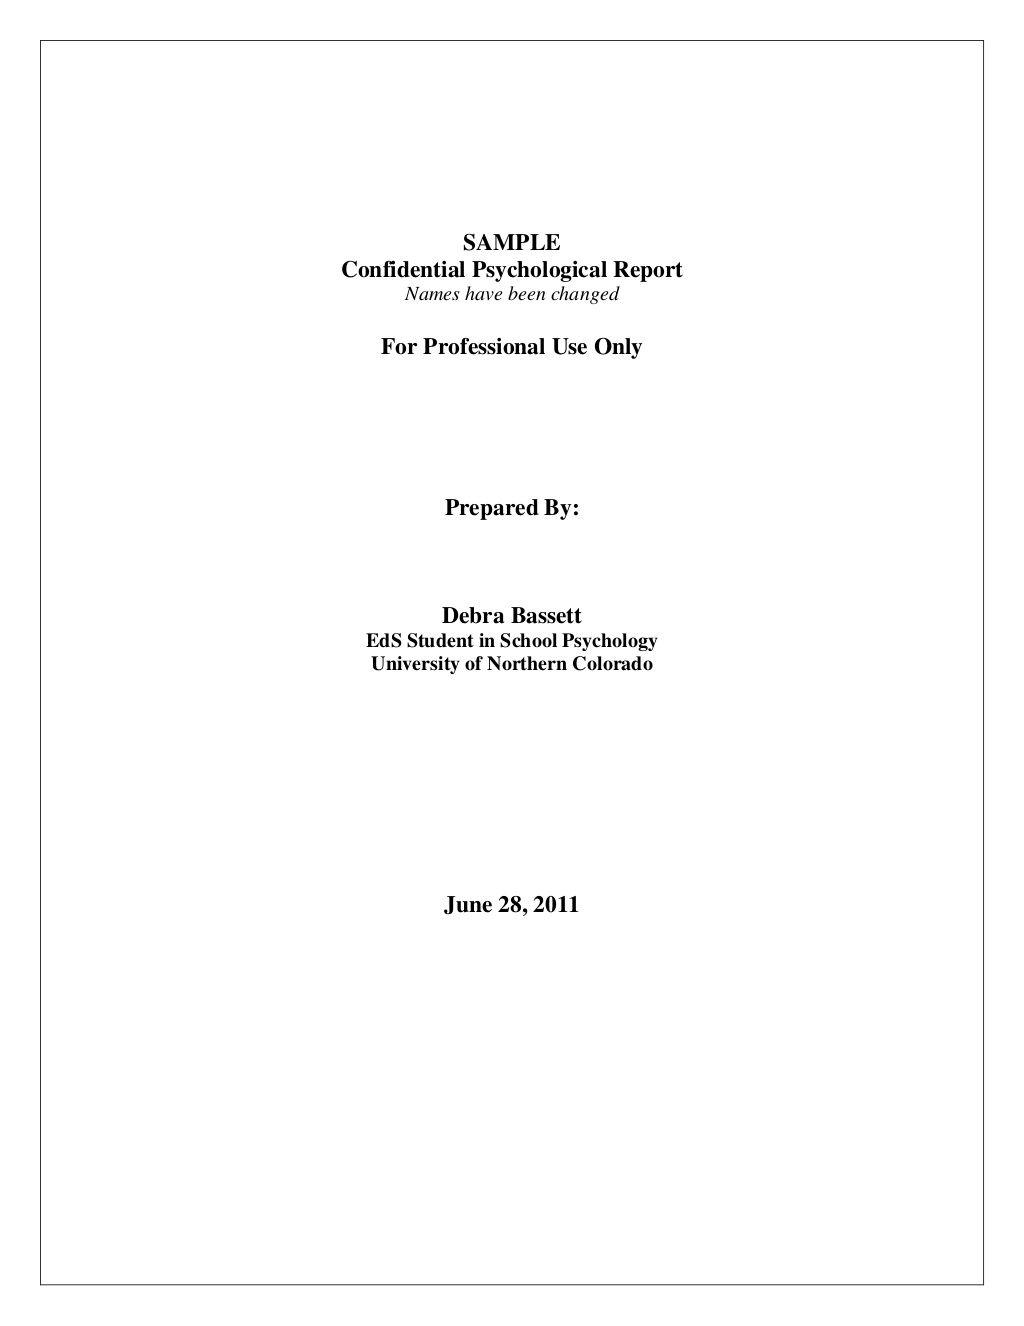 Full Psychological Report Sample By Debrajean333 Via Slideshare